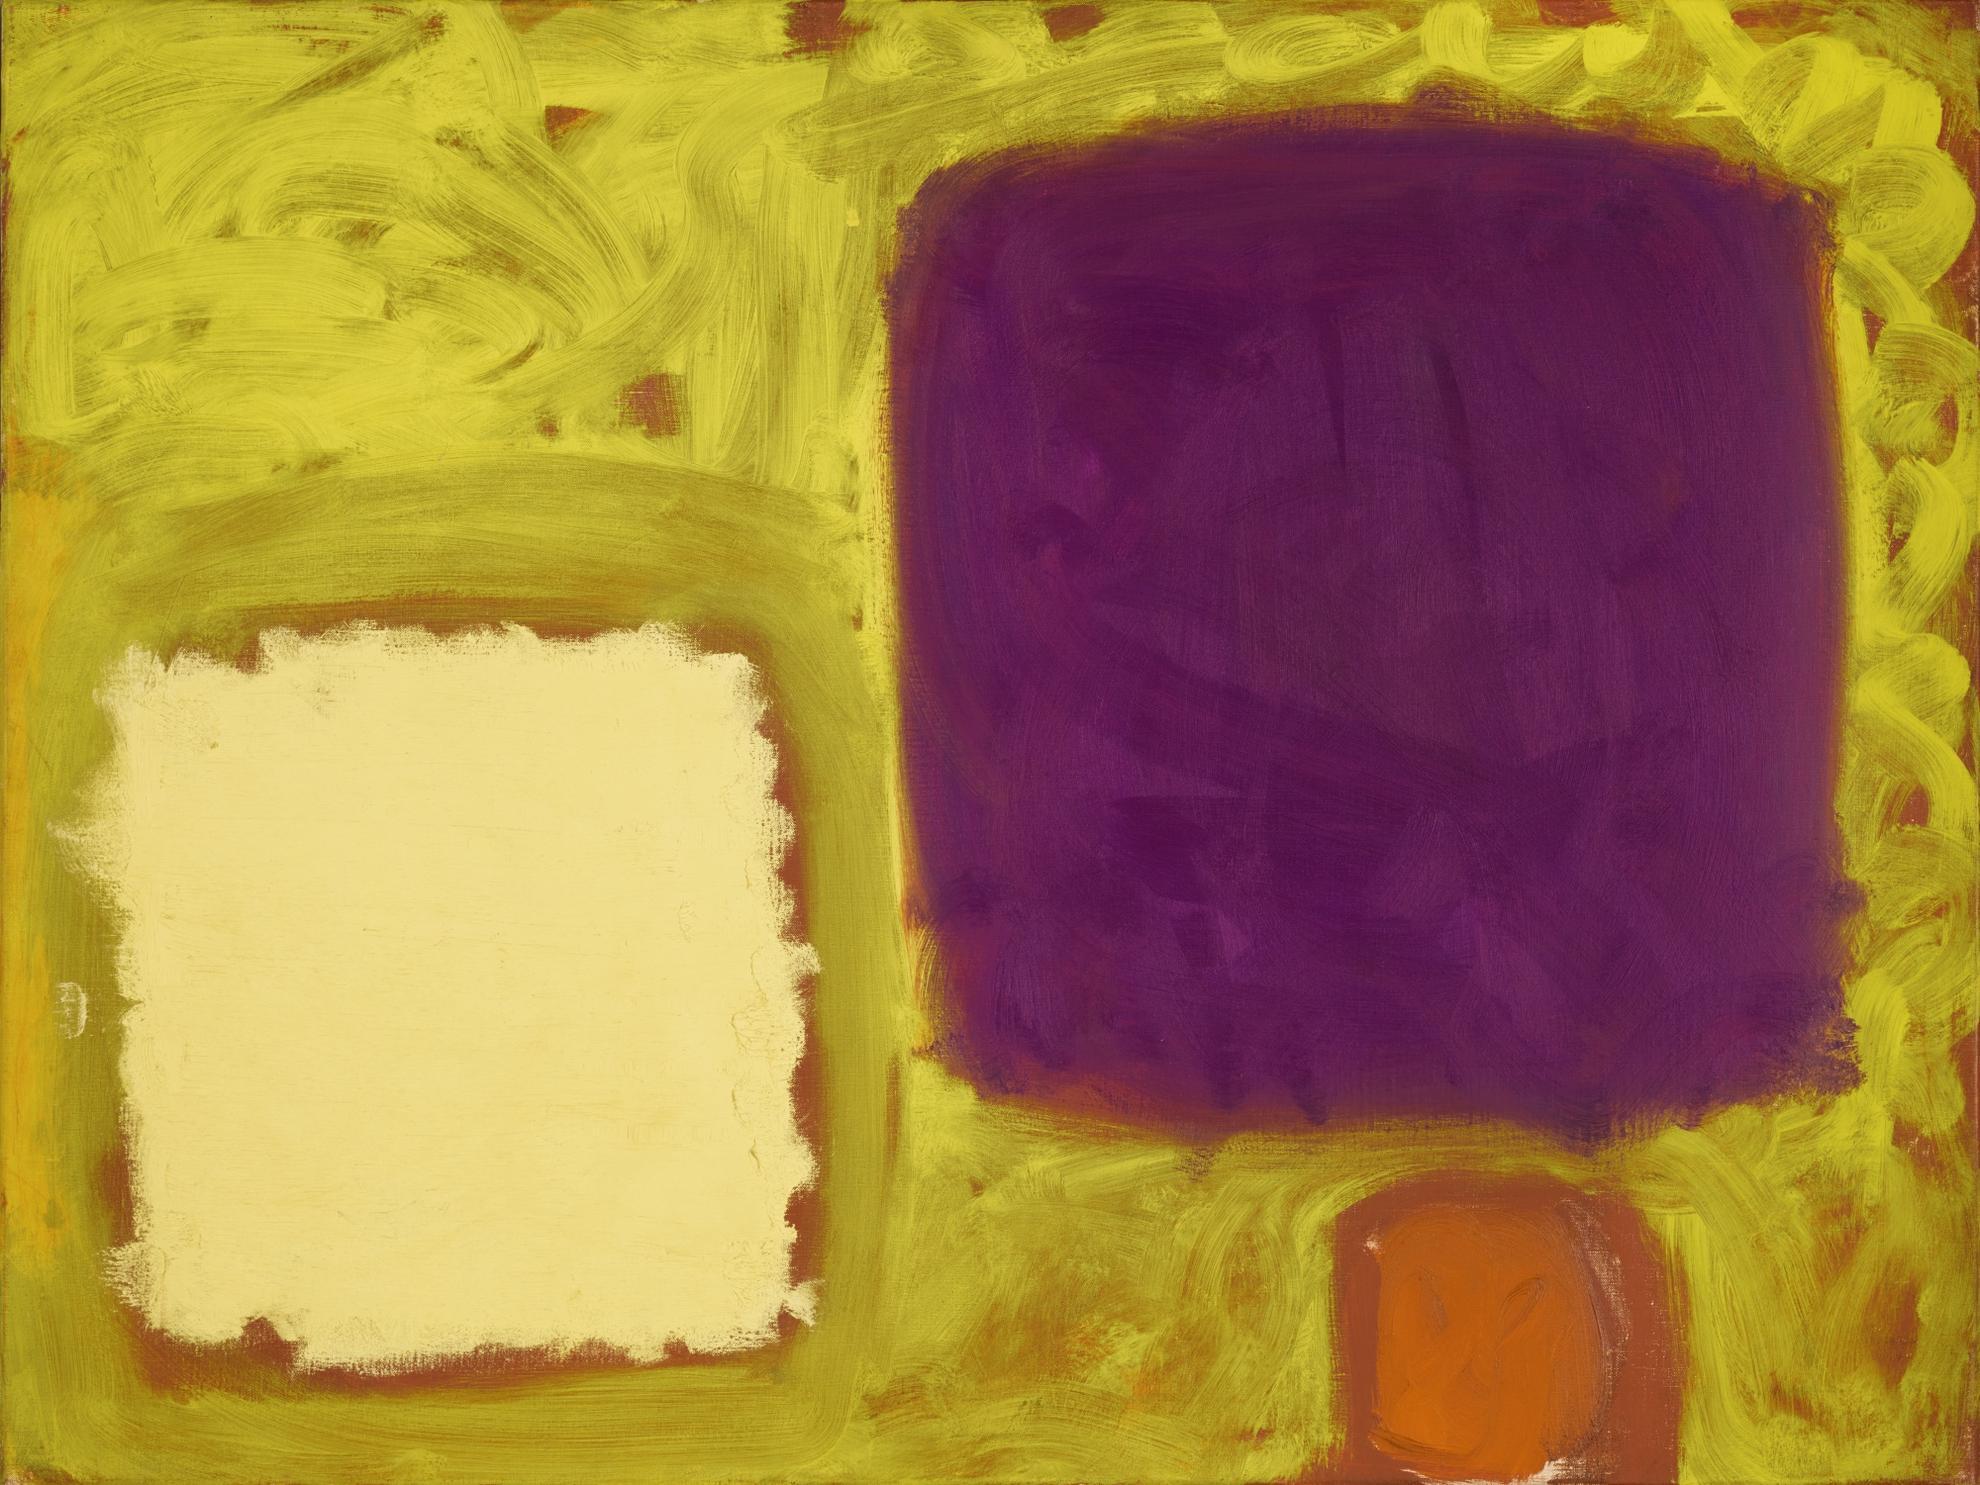 Patrick Heron-January Yellows (Naples & Violet): January 1960-1960